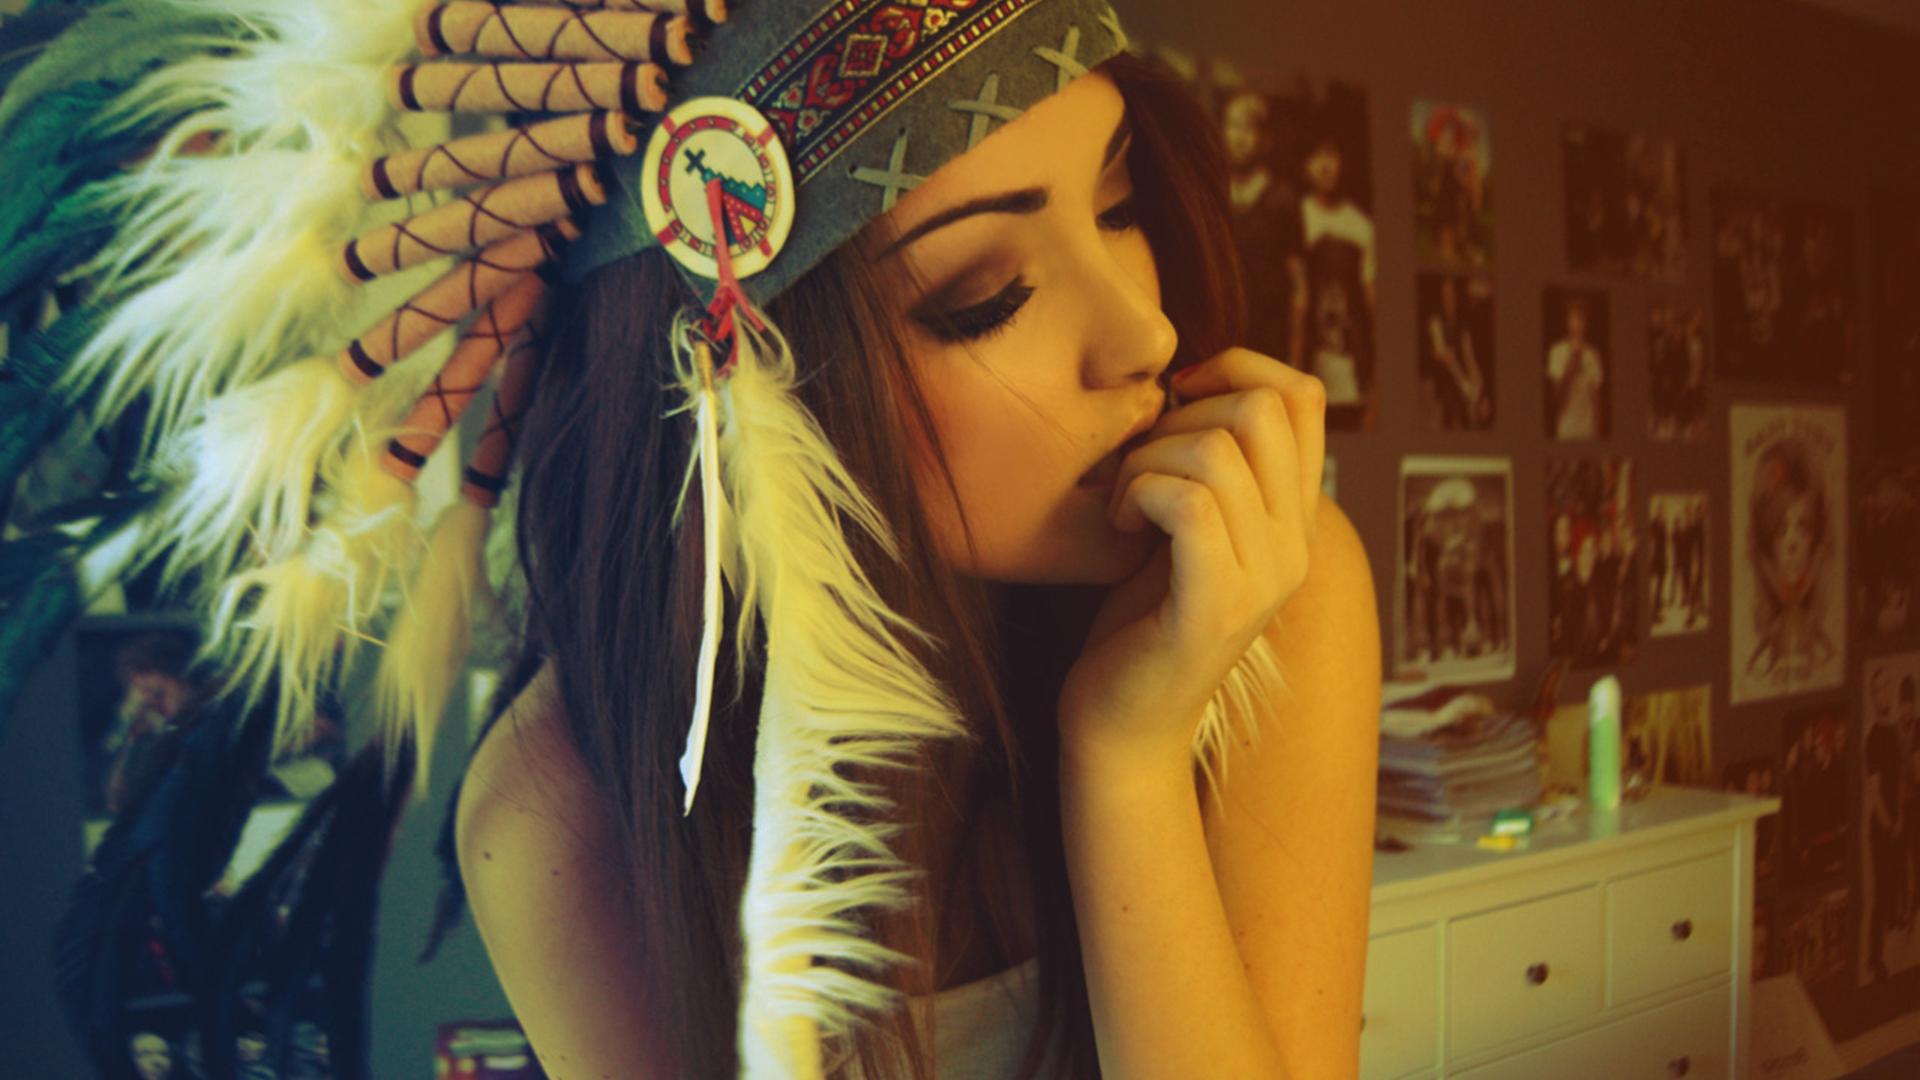 Melanie Iglesias Indian Hat Beauty Model Wallpaper - http ...